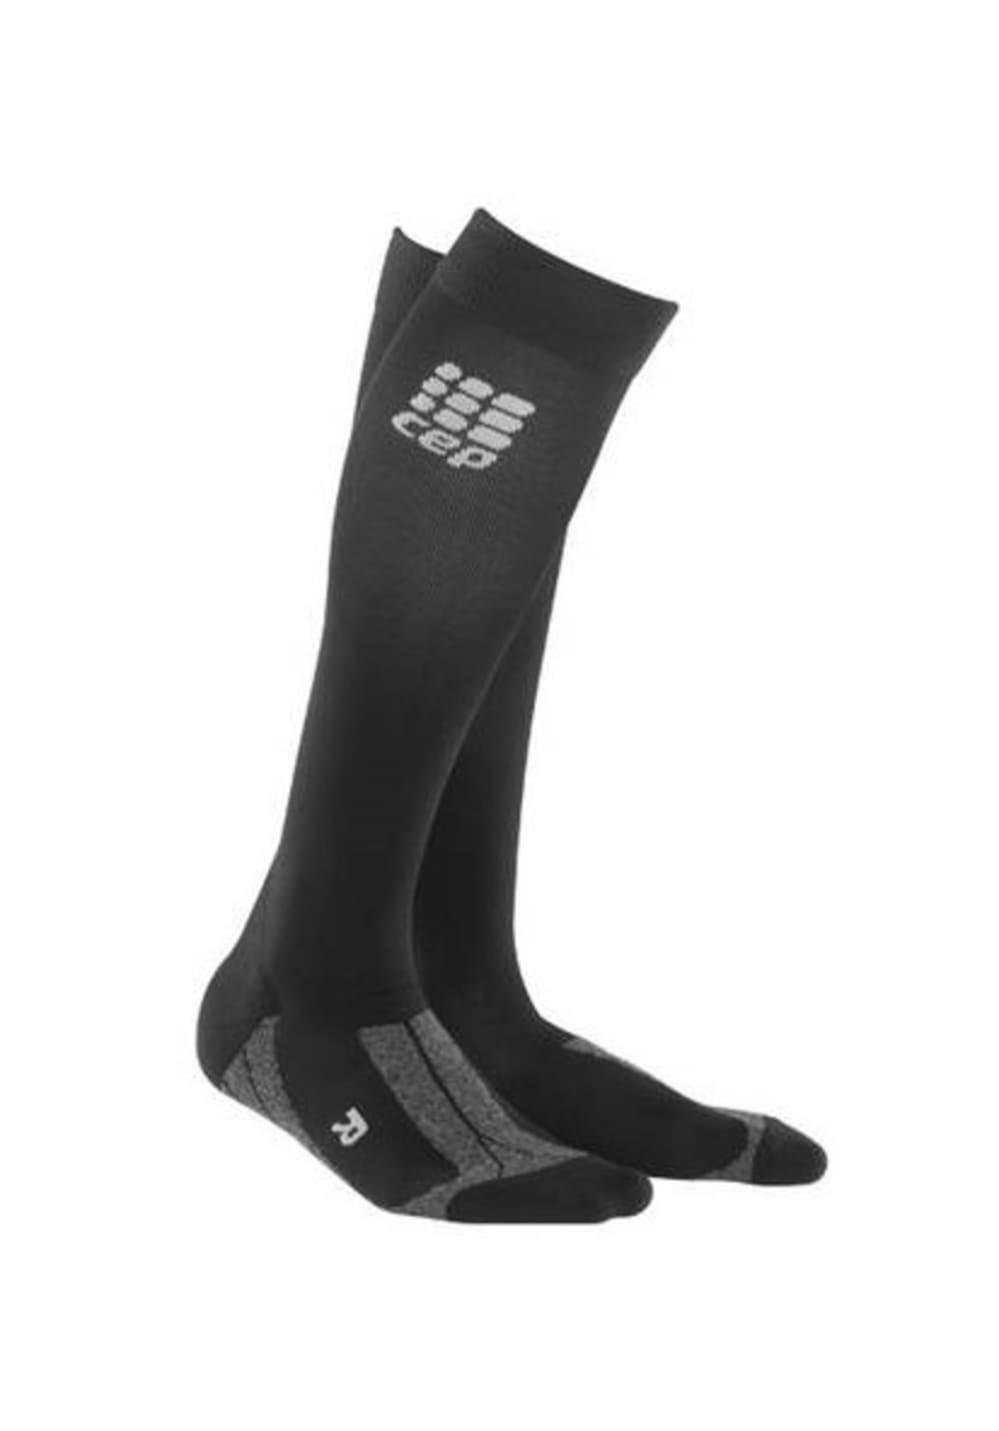 CEP Recovery Compression Socks - Kompression für Damen - Schwarz